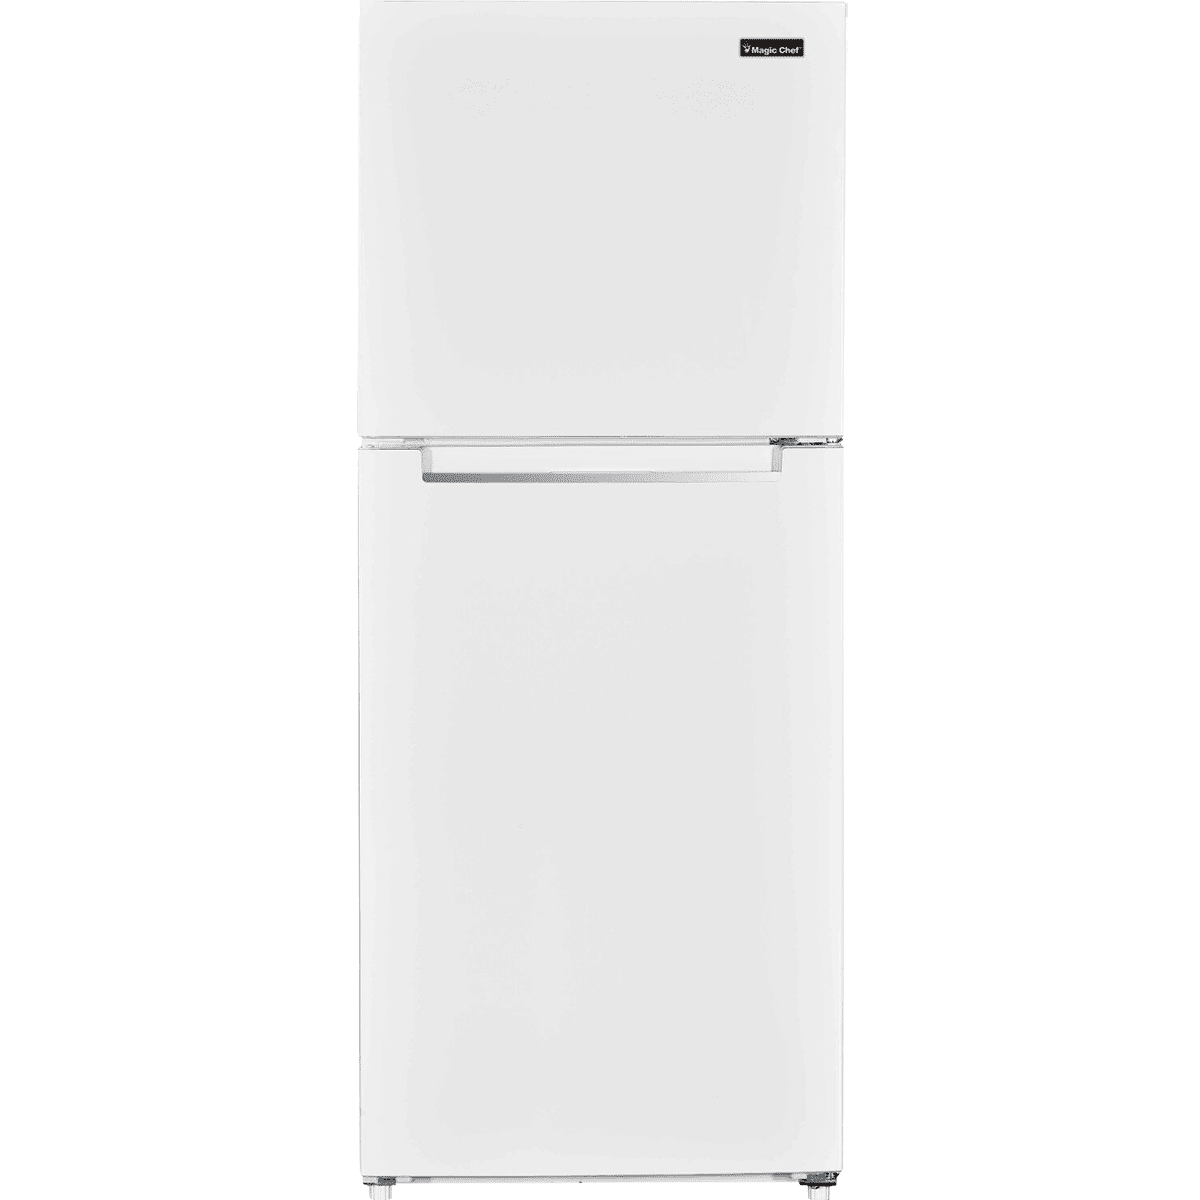 Image of Magic Chef 10.1 Cu. Ft. Energy Star Refrigerator - White